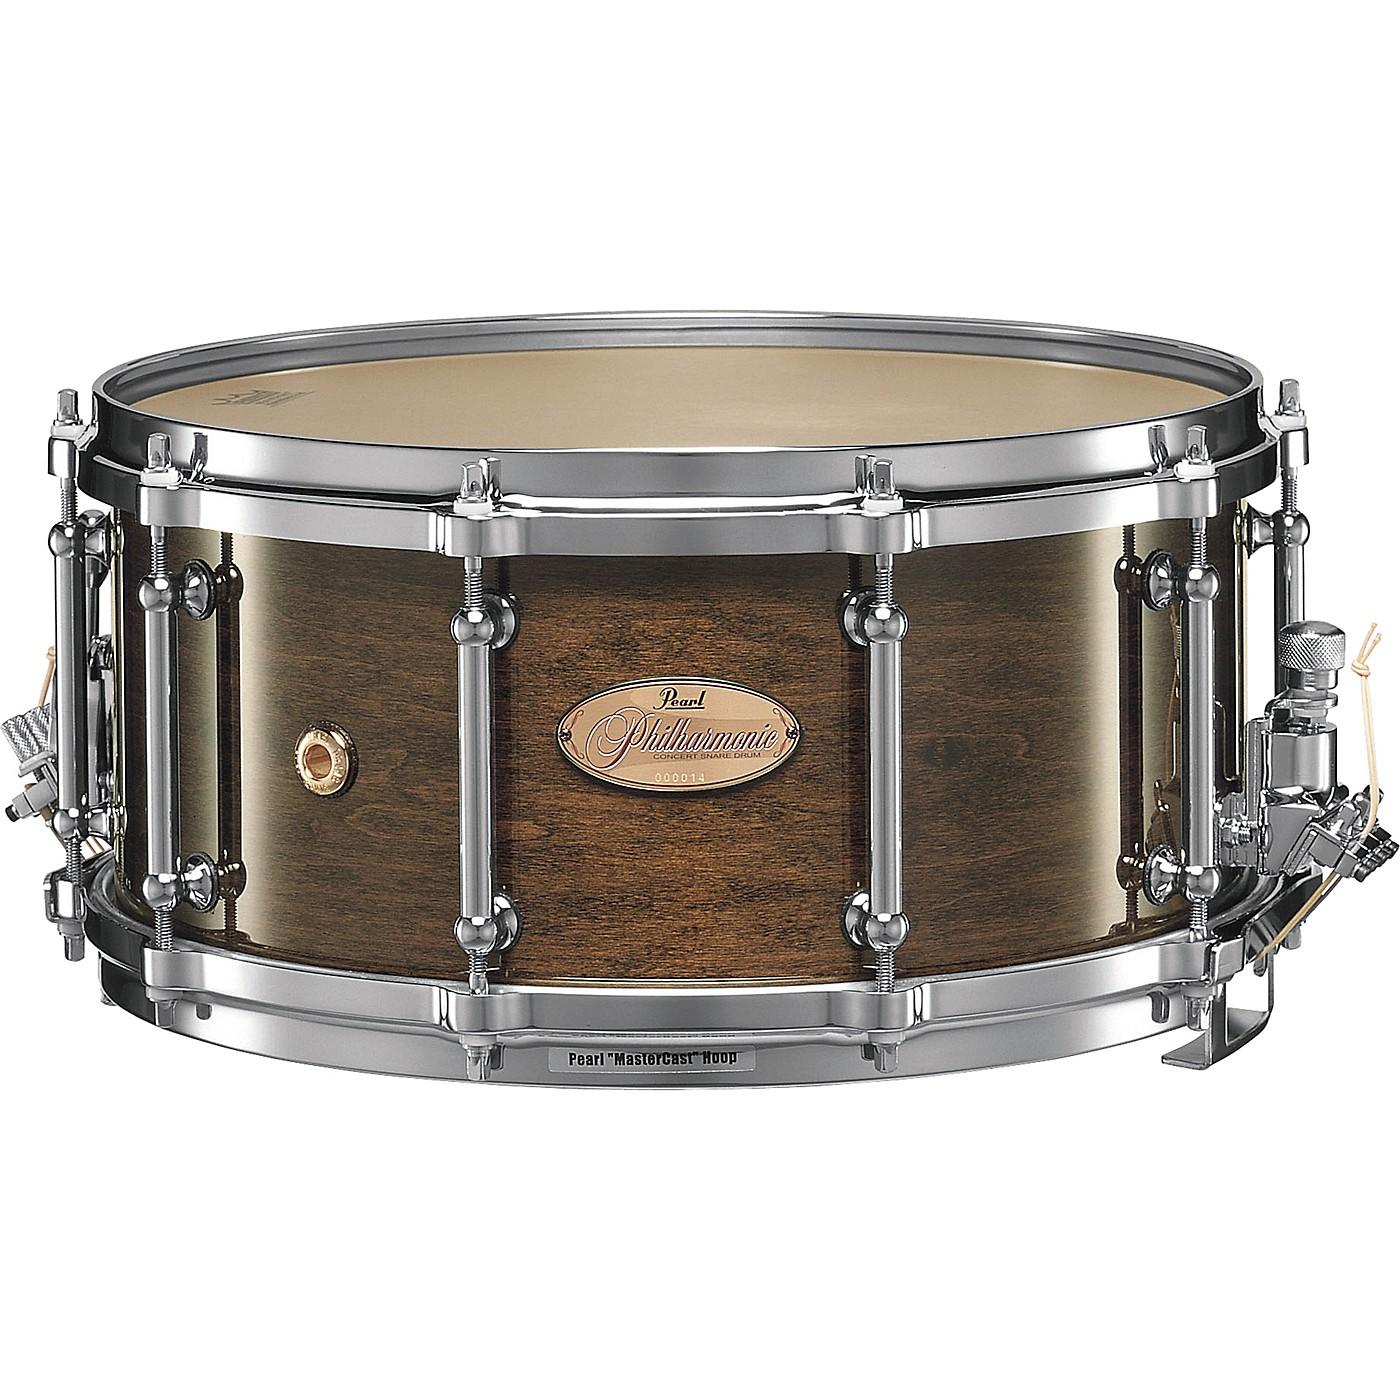 Pearl Philharmonic Snare Drum Concert Drums thumbnail